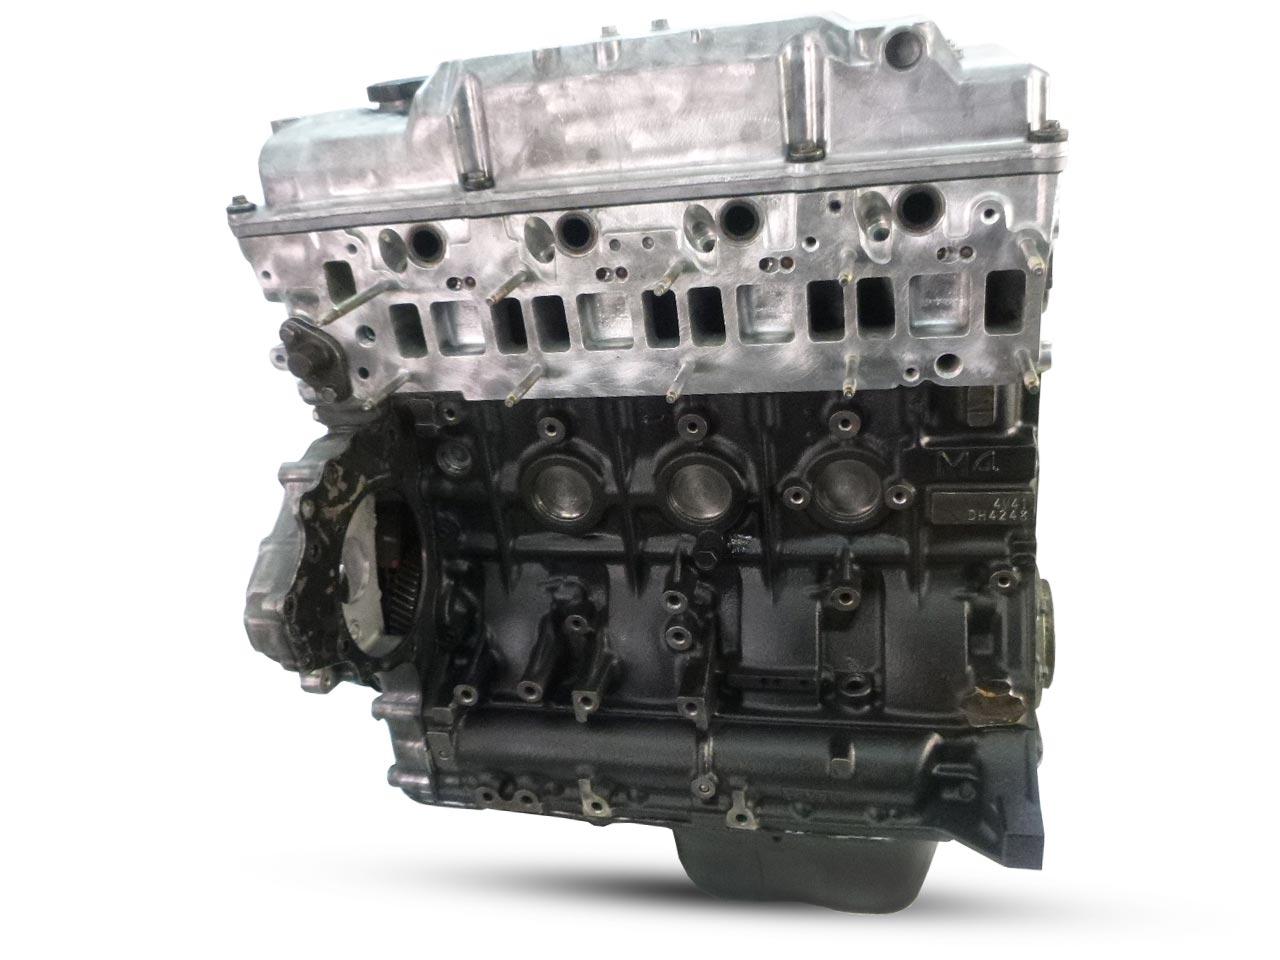 Motor Mitsubishi Pajero 3 III Shogun 3,2 Di-D Diesel 4M41 DE303398